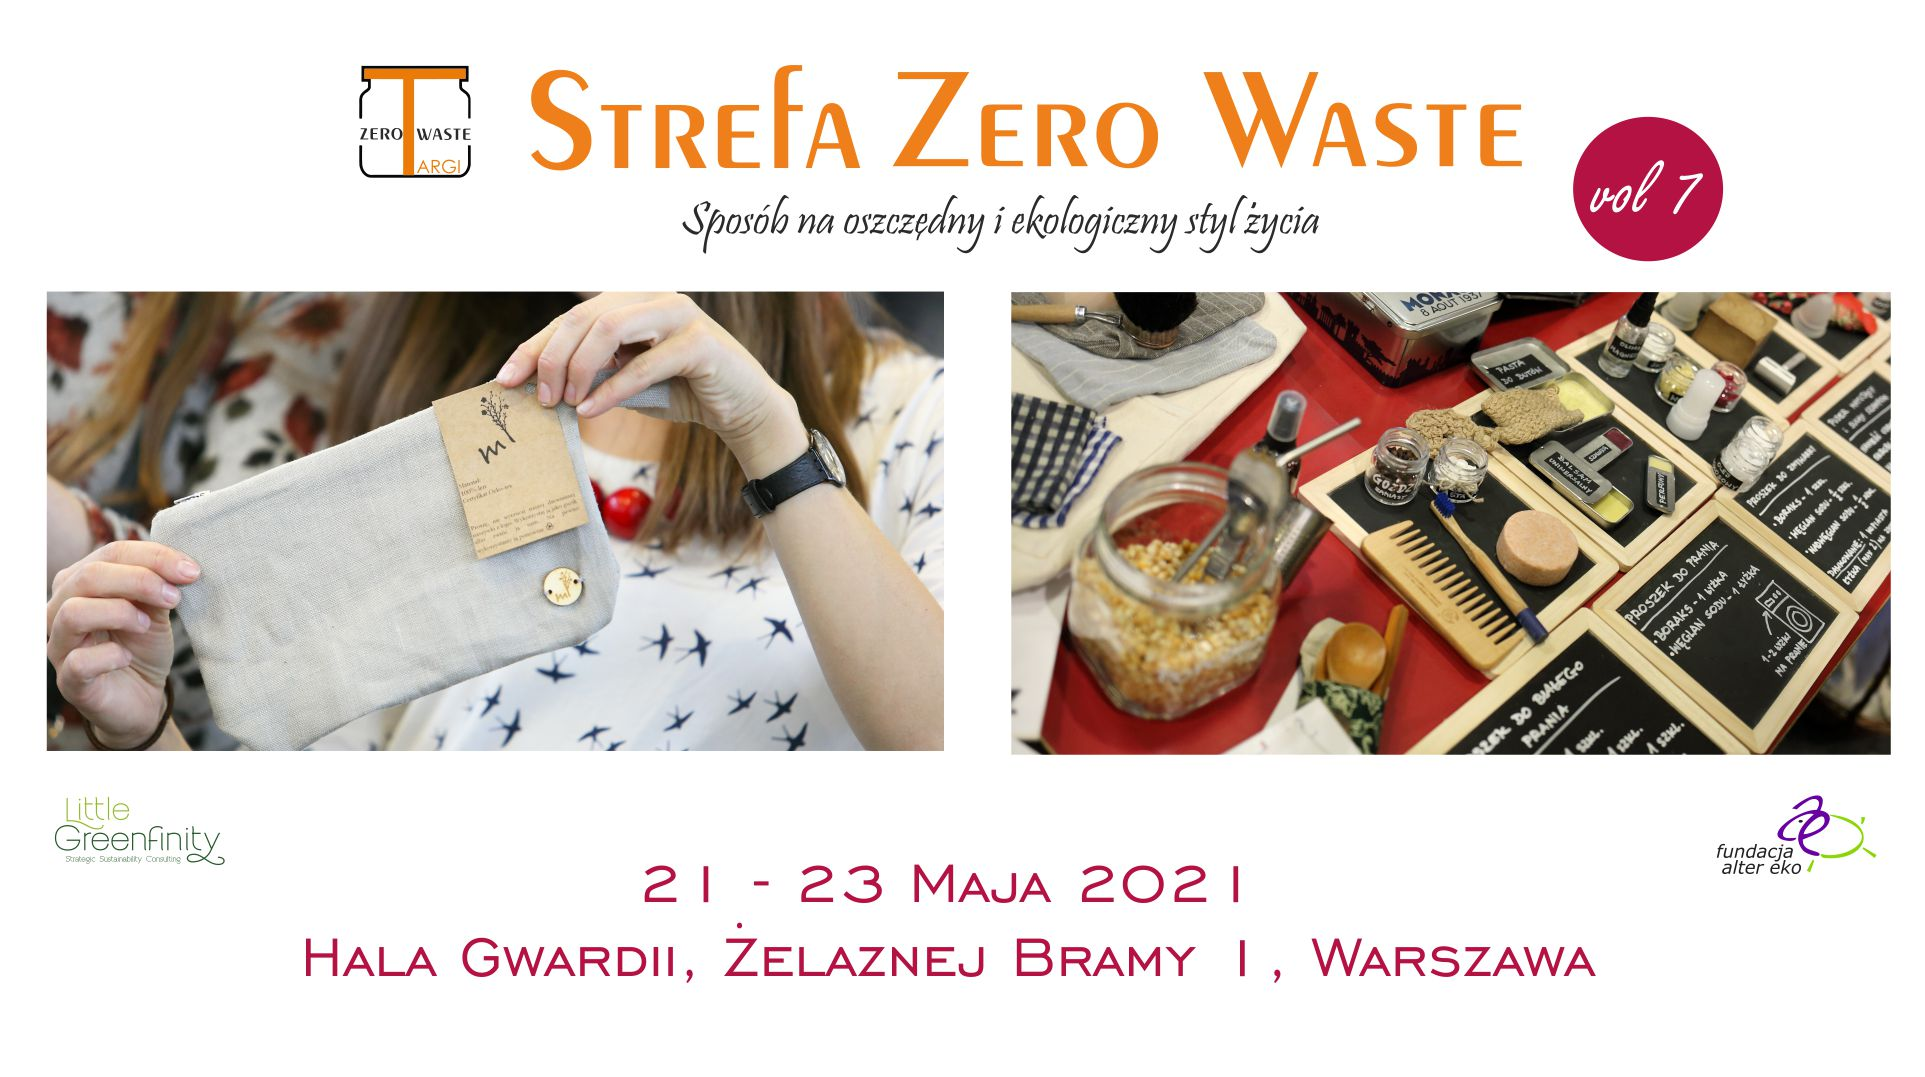 Strefa Zero Waste